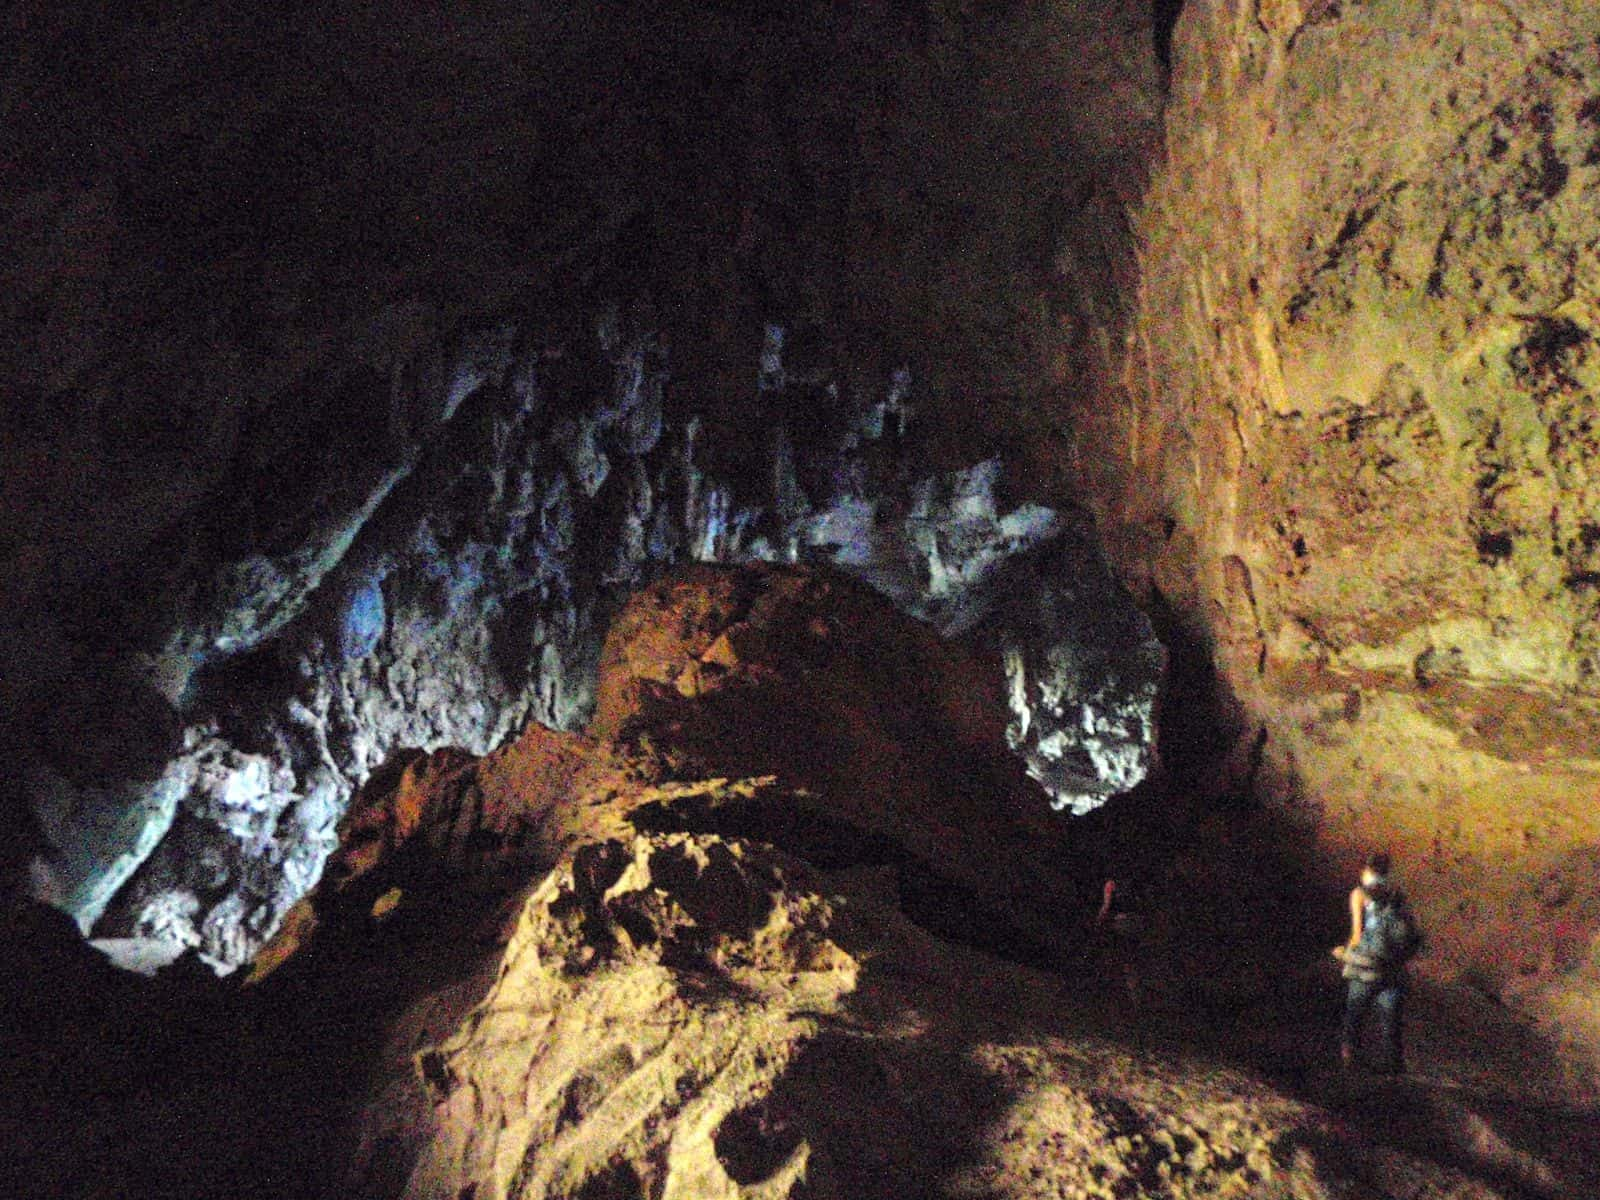 Khong Lor Cave, Thakhek, Laos.